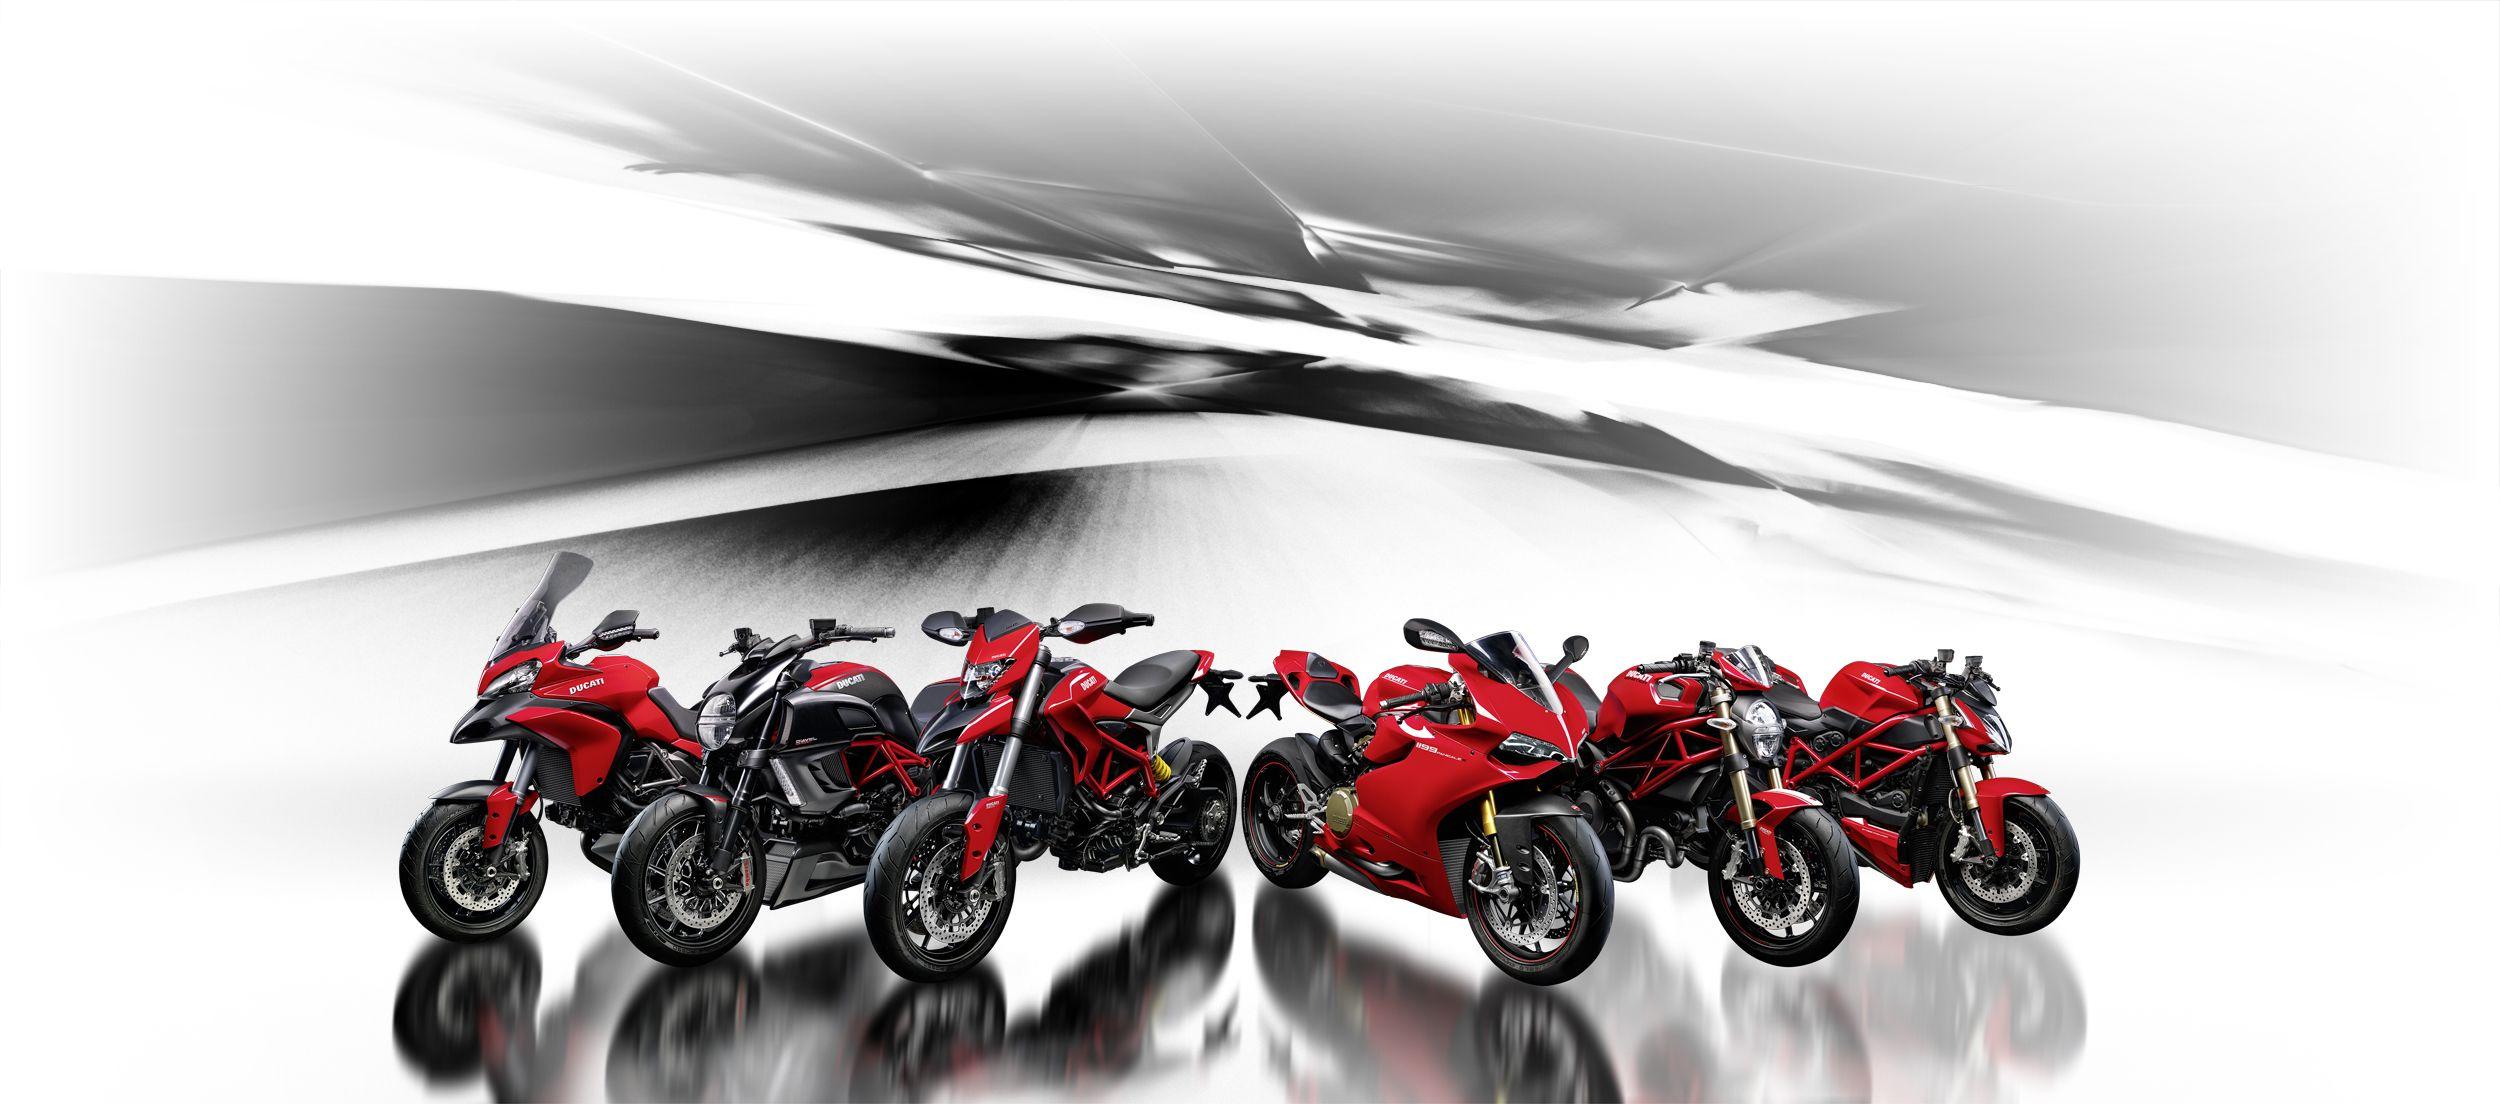 The Current Ducati Model Range In 2013 Ducati Decisions